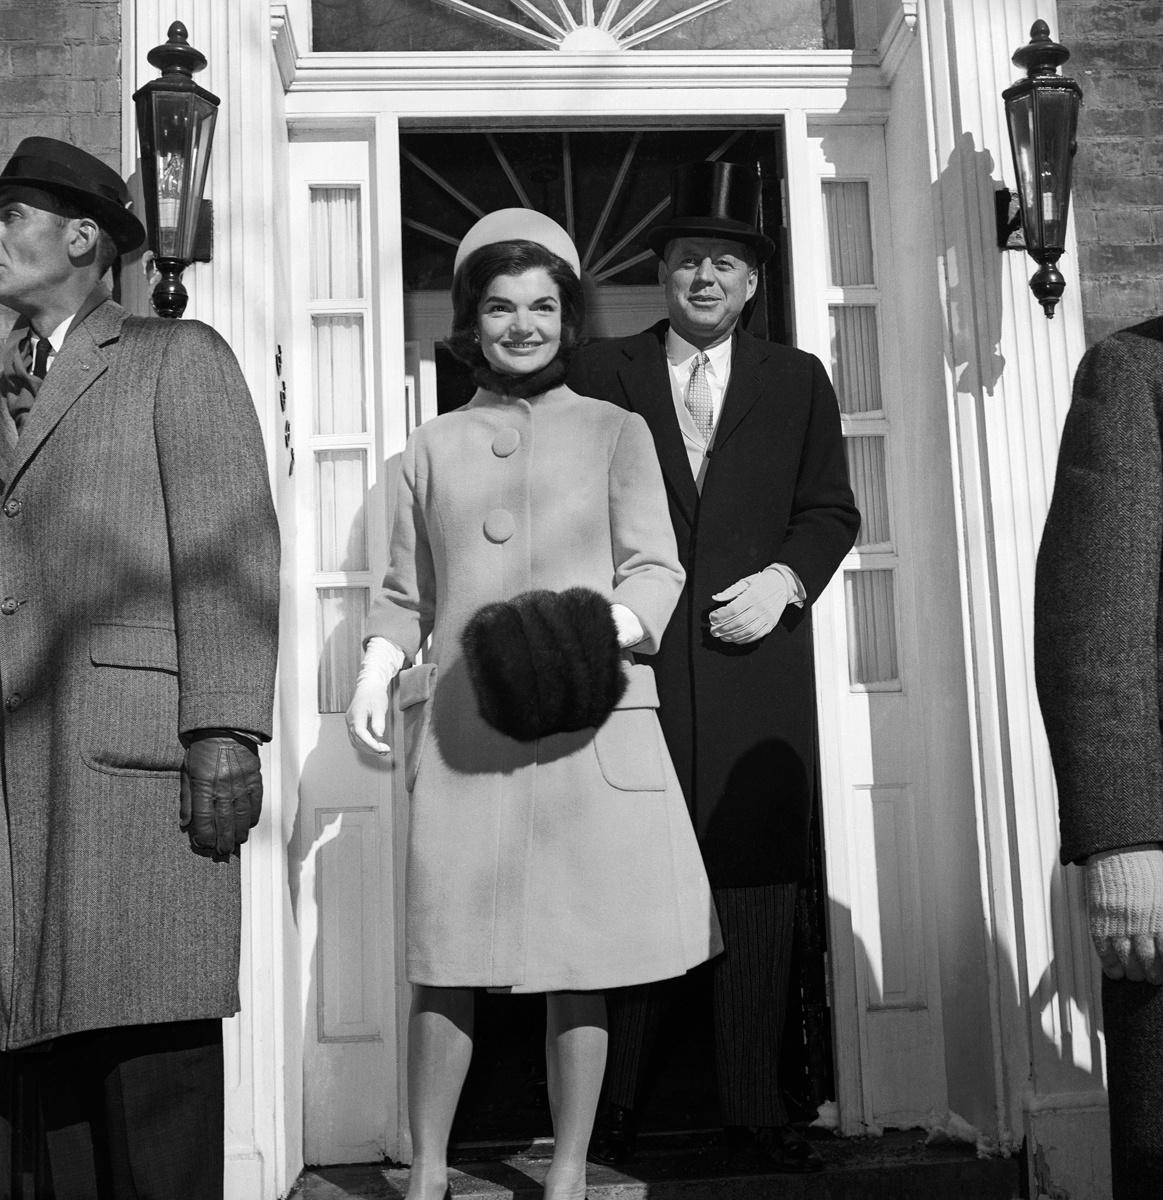 Jacqueline Kennedy inaguration-ceremony-coat-and-dress